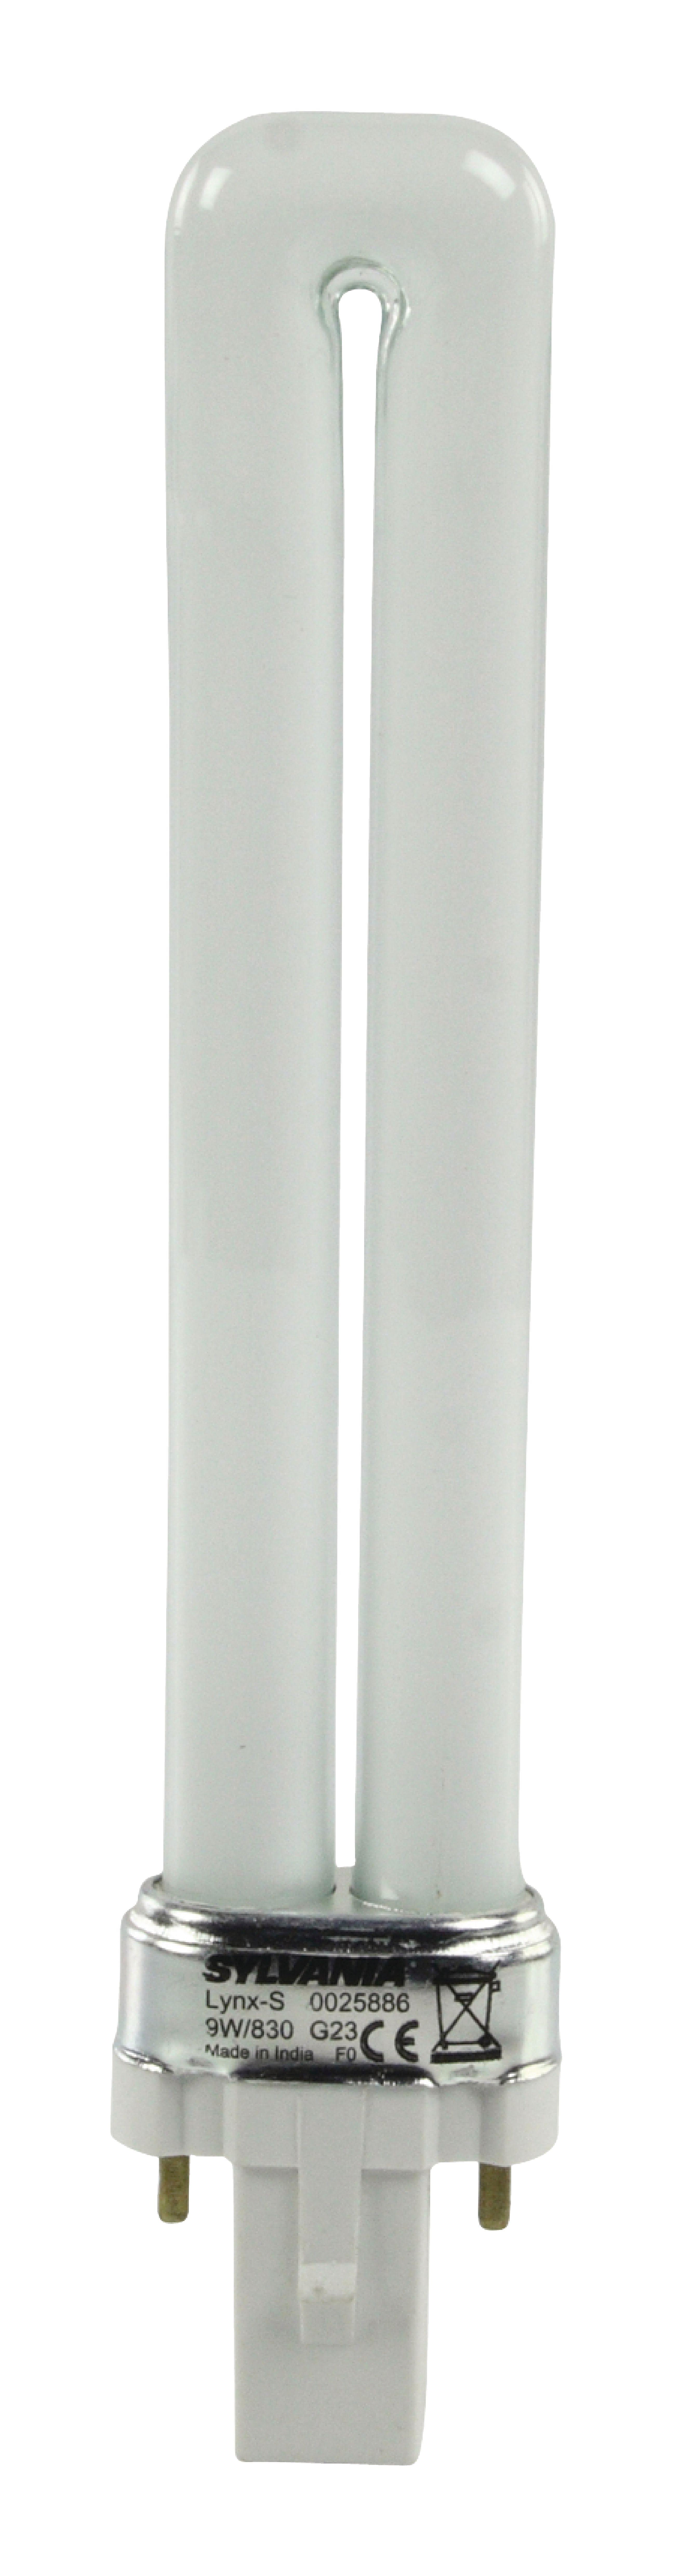 leuchtstofflampe-g23-stick-9-w-600-lm-3300-k